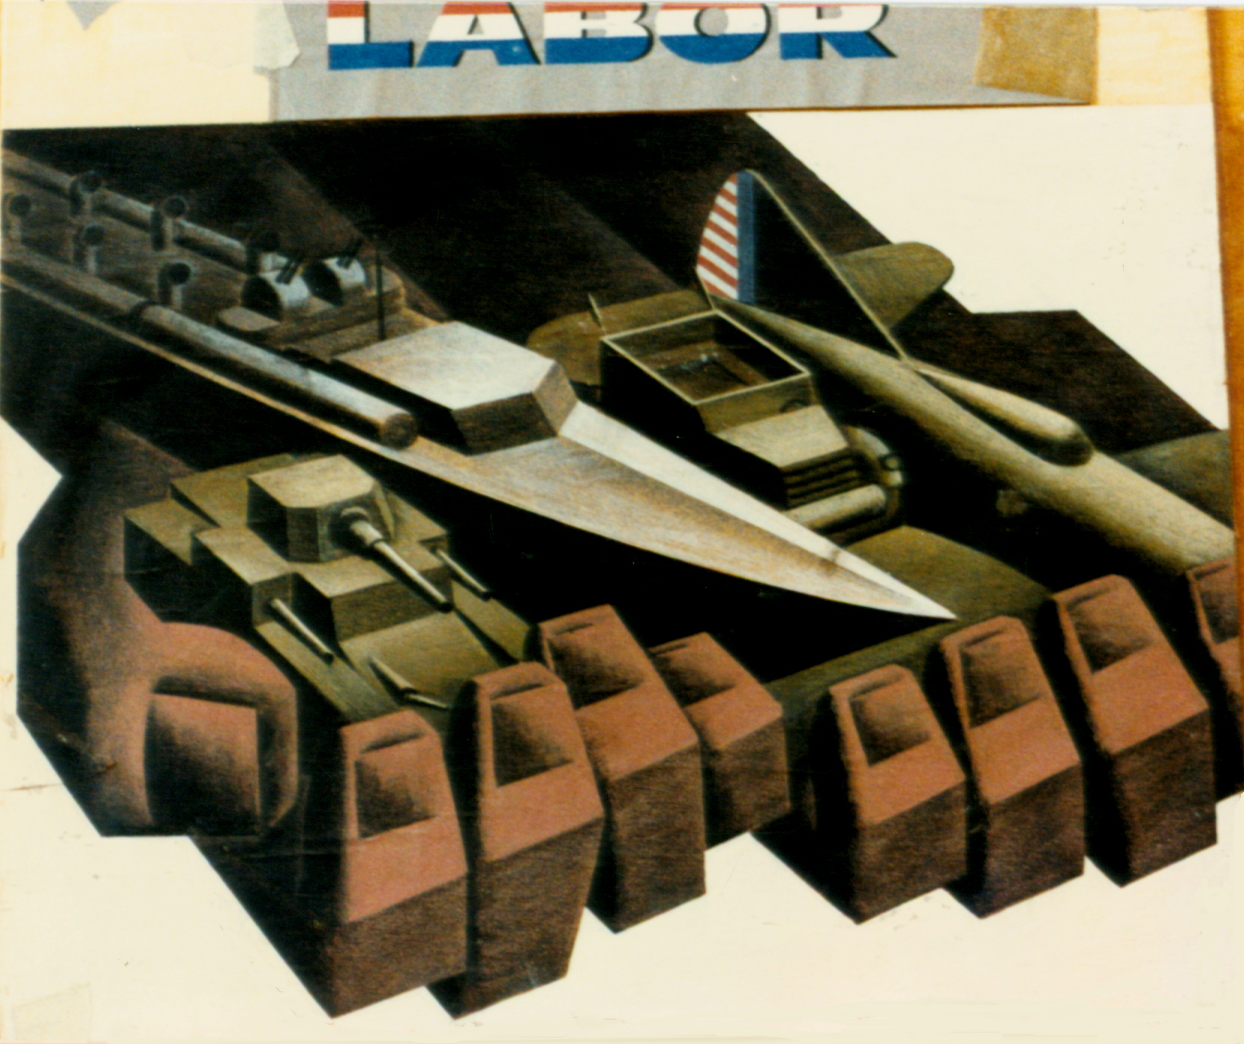 """Labor - We Produce"" - Size: 25 sq. ft. - Gustav Rehberger"